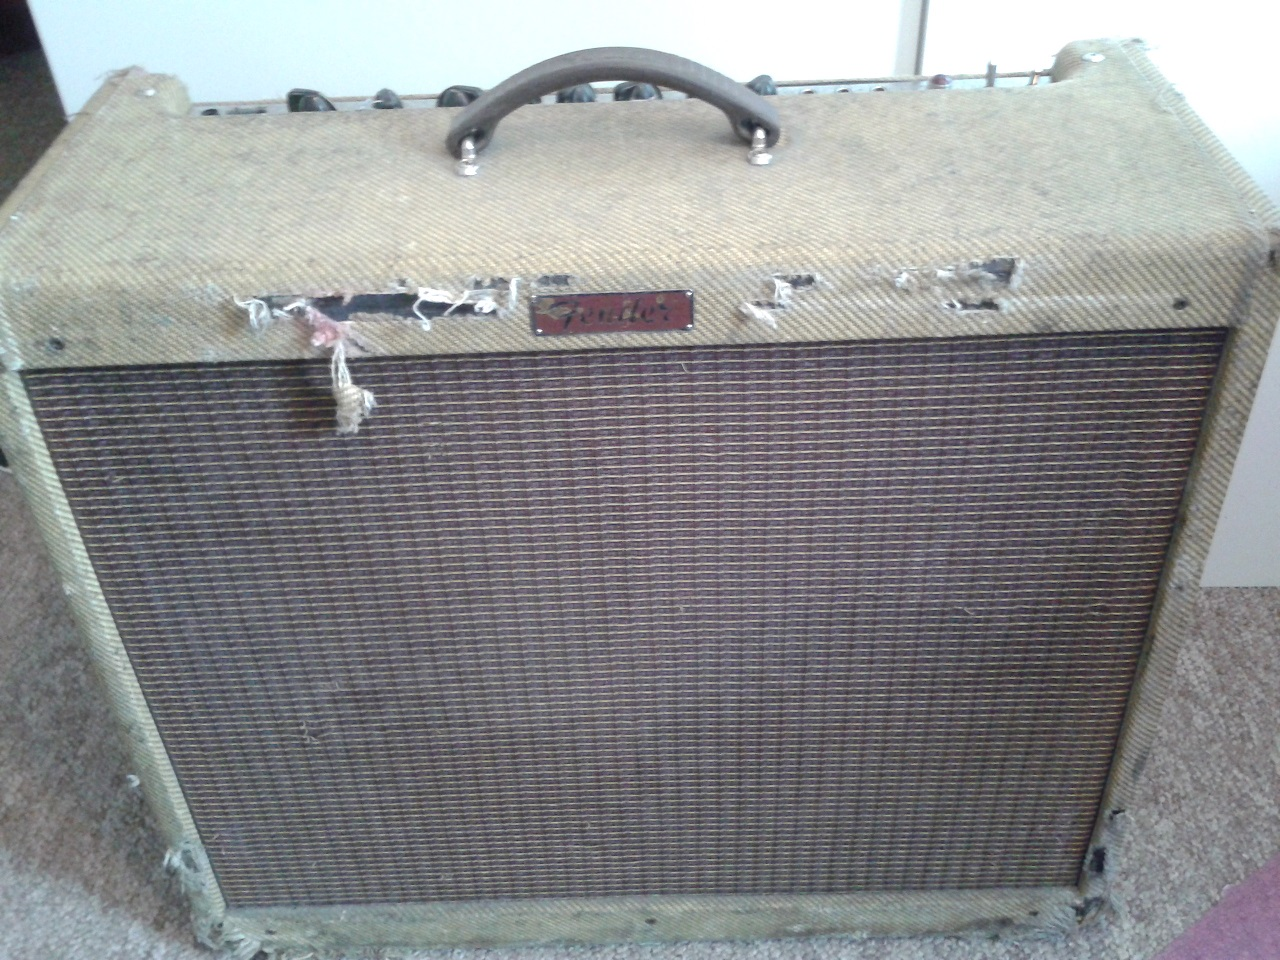 Fender-Repair-Blues-DeVille-Repair